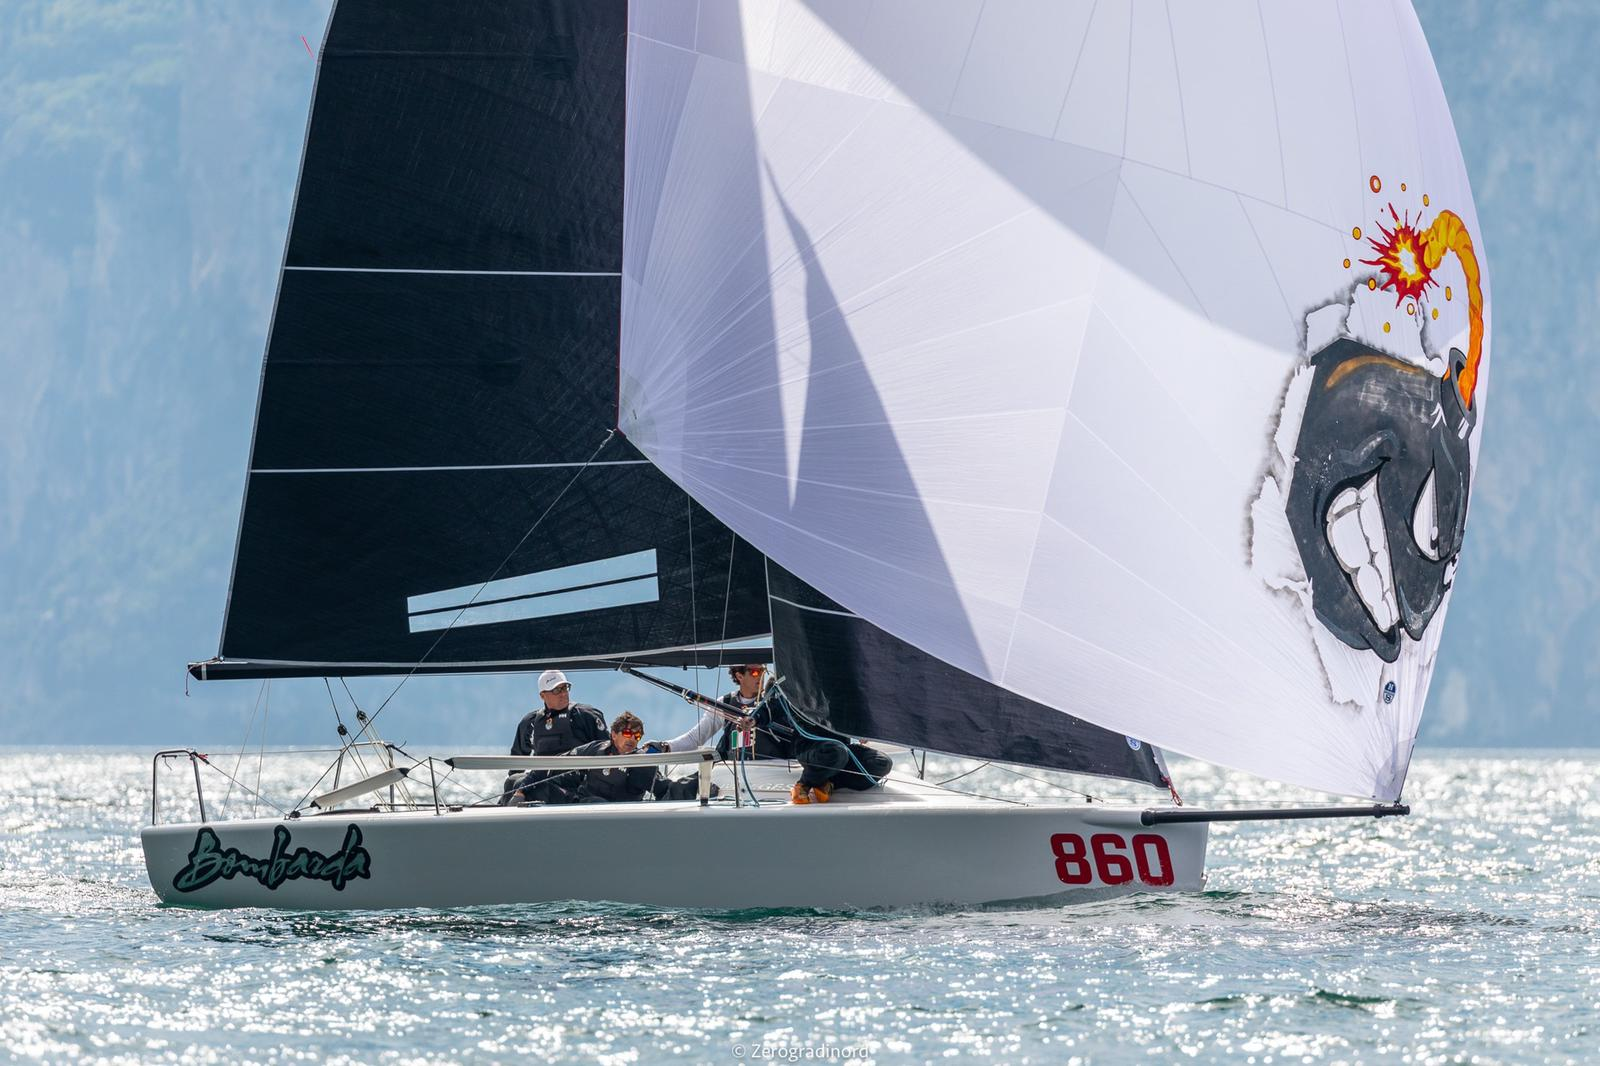 Bronzo per Bombarda Racing nella Melges 24 - NEWS - Yacht Club Costa Smeralda